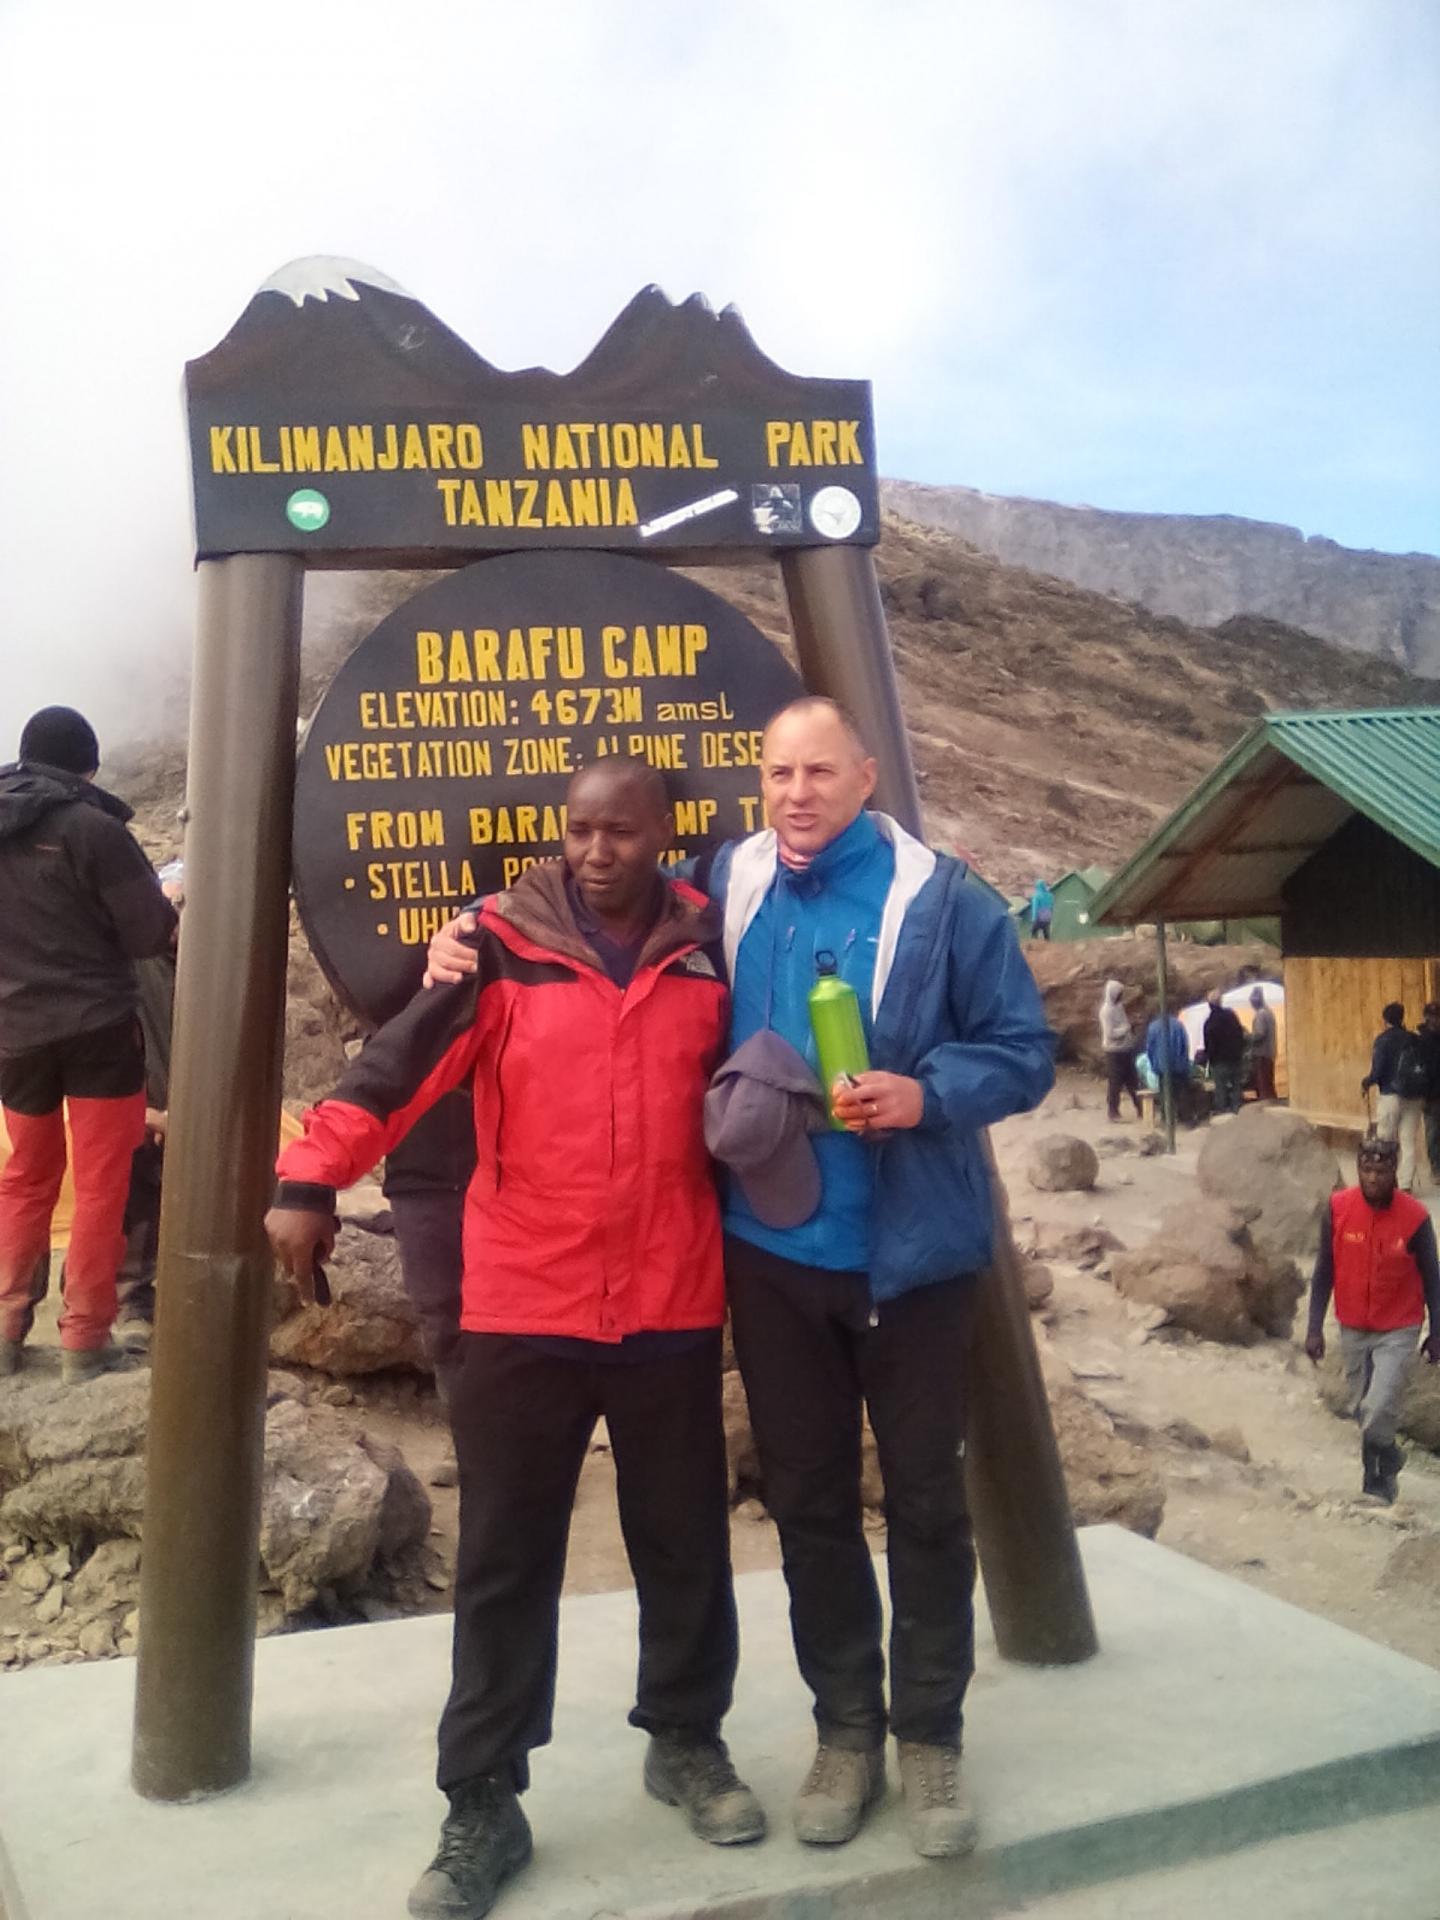 Small group adventure climbing Mt Kilimanjaro.